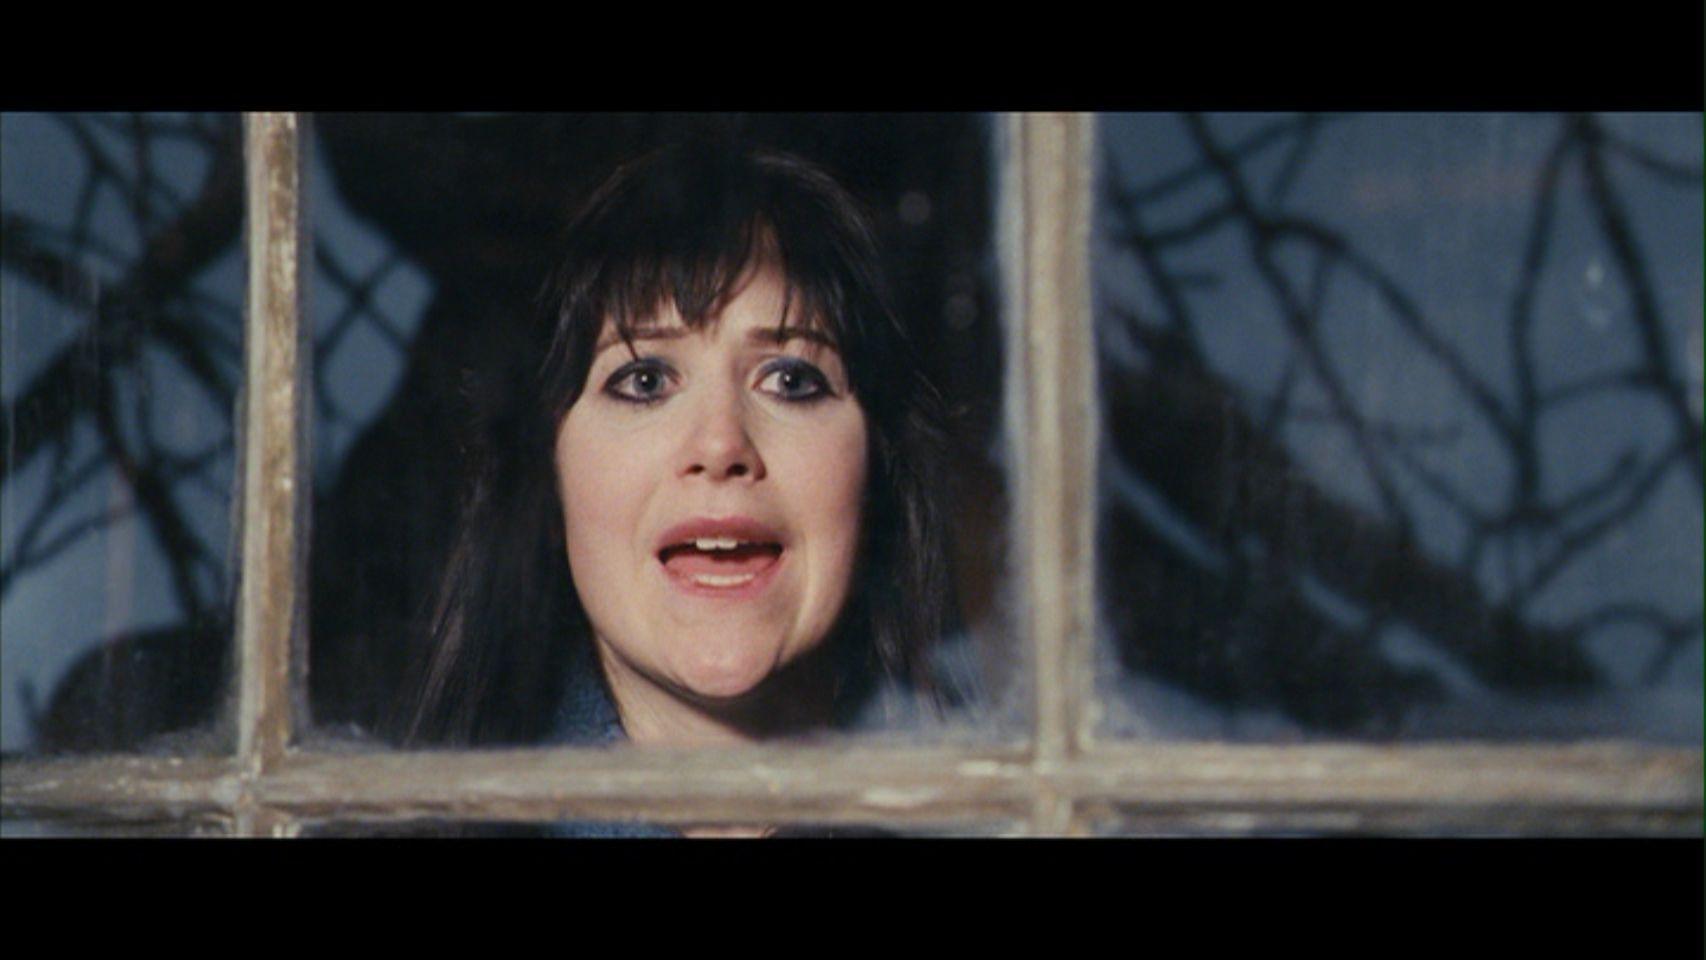 The Lovely Bones - The Lovely Bones (The film) Image ...